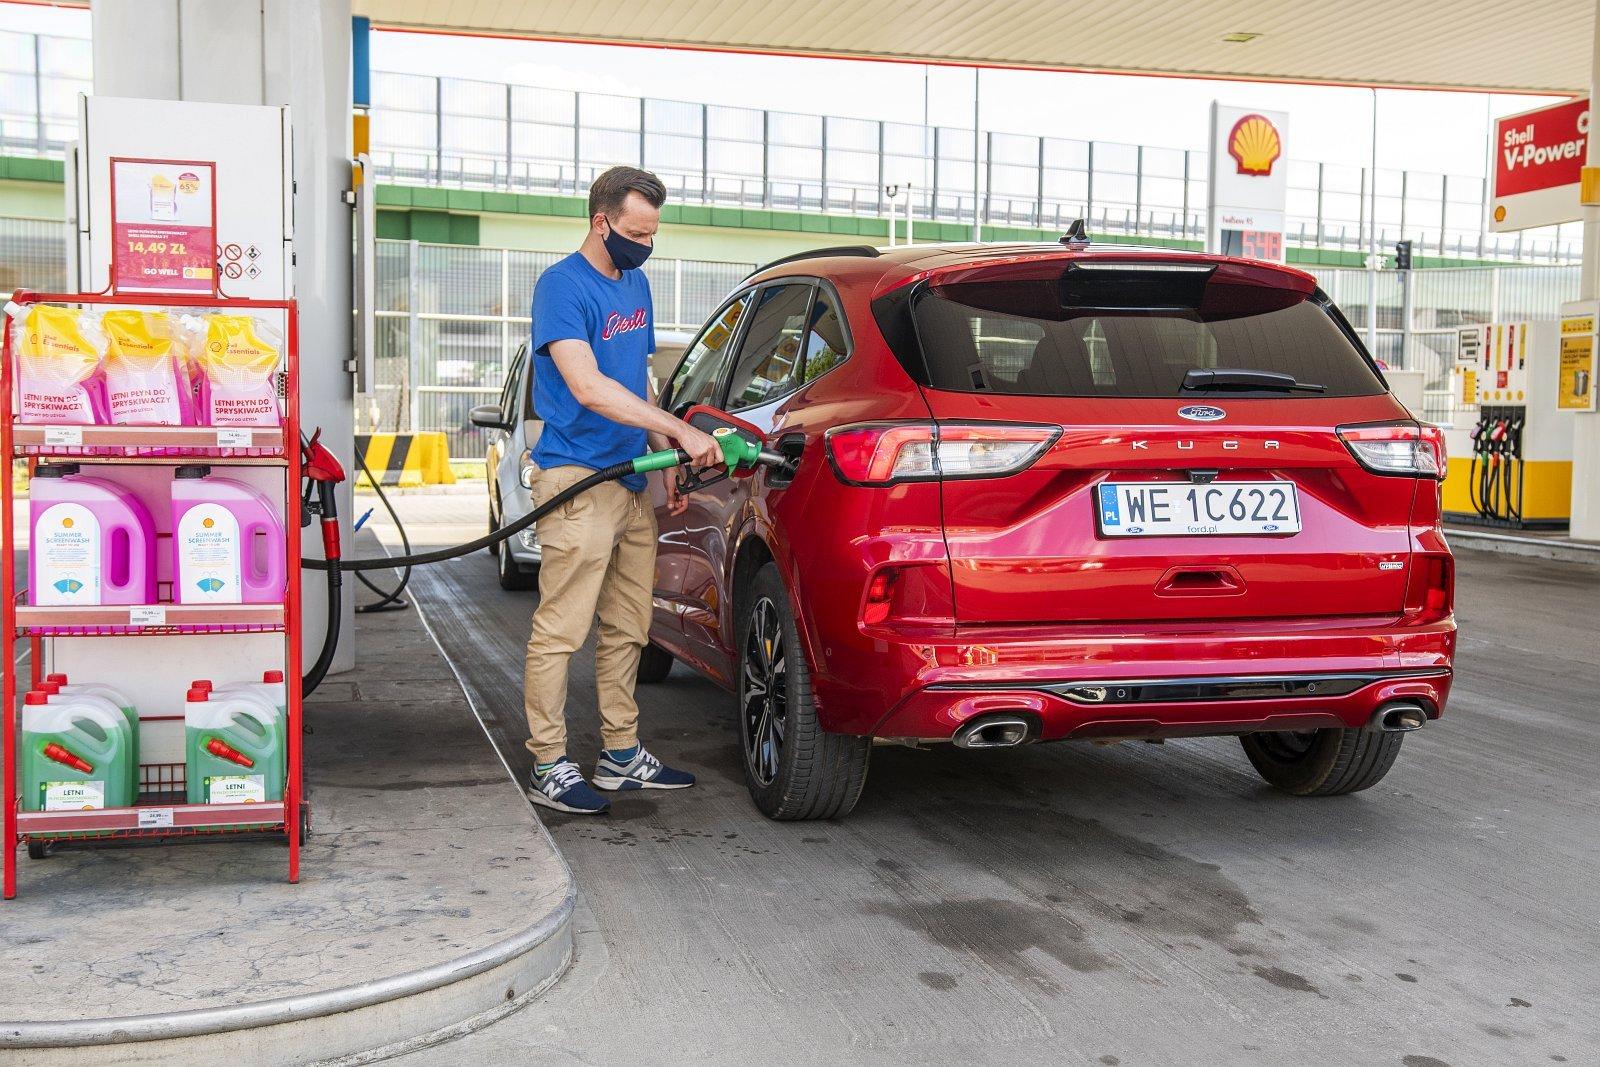 ford kuga plug-in hybrid hybryda 2021 test zużycie paliwa